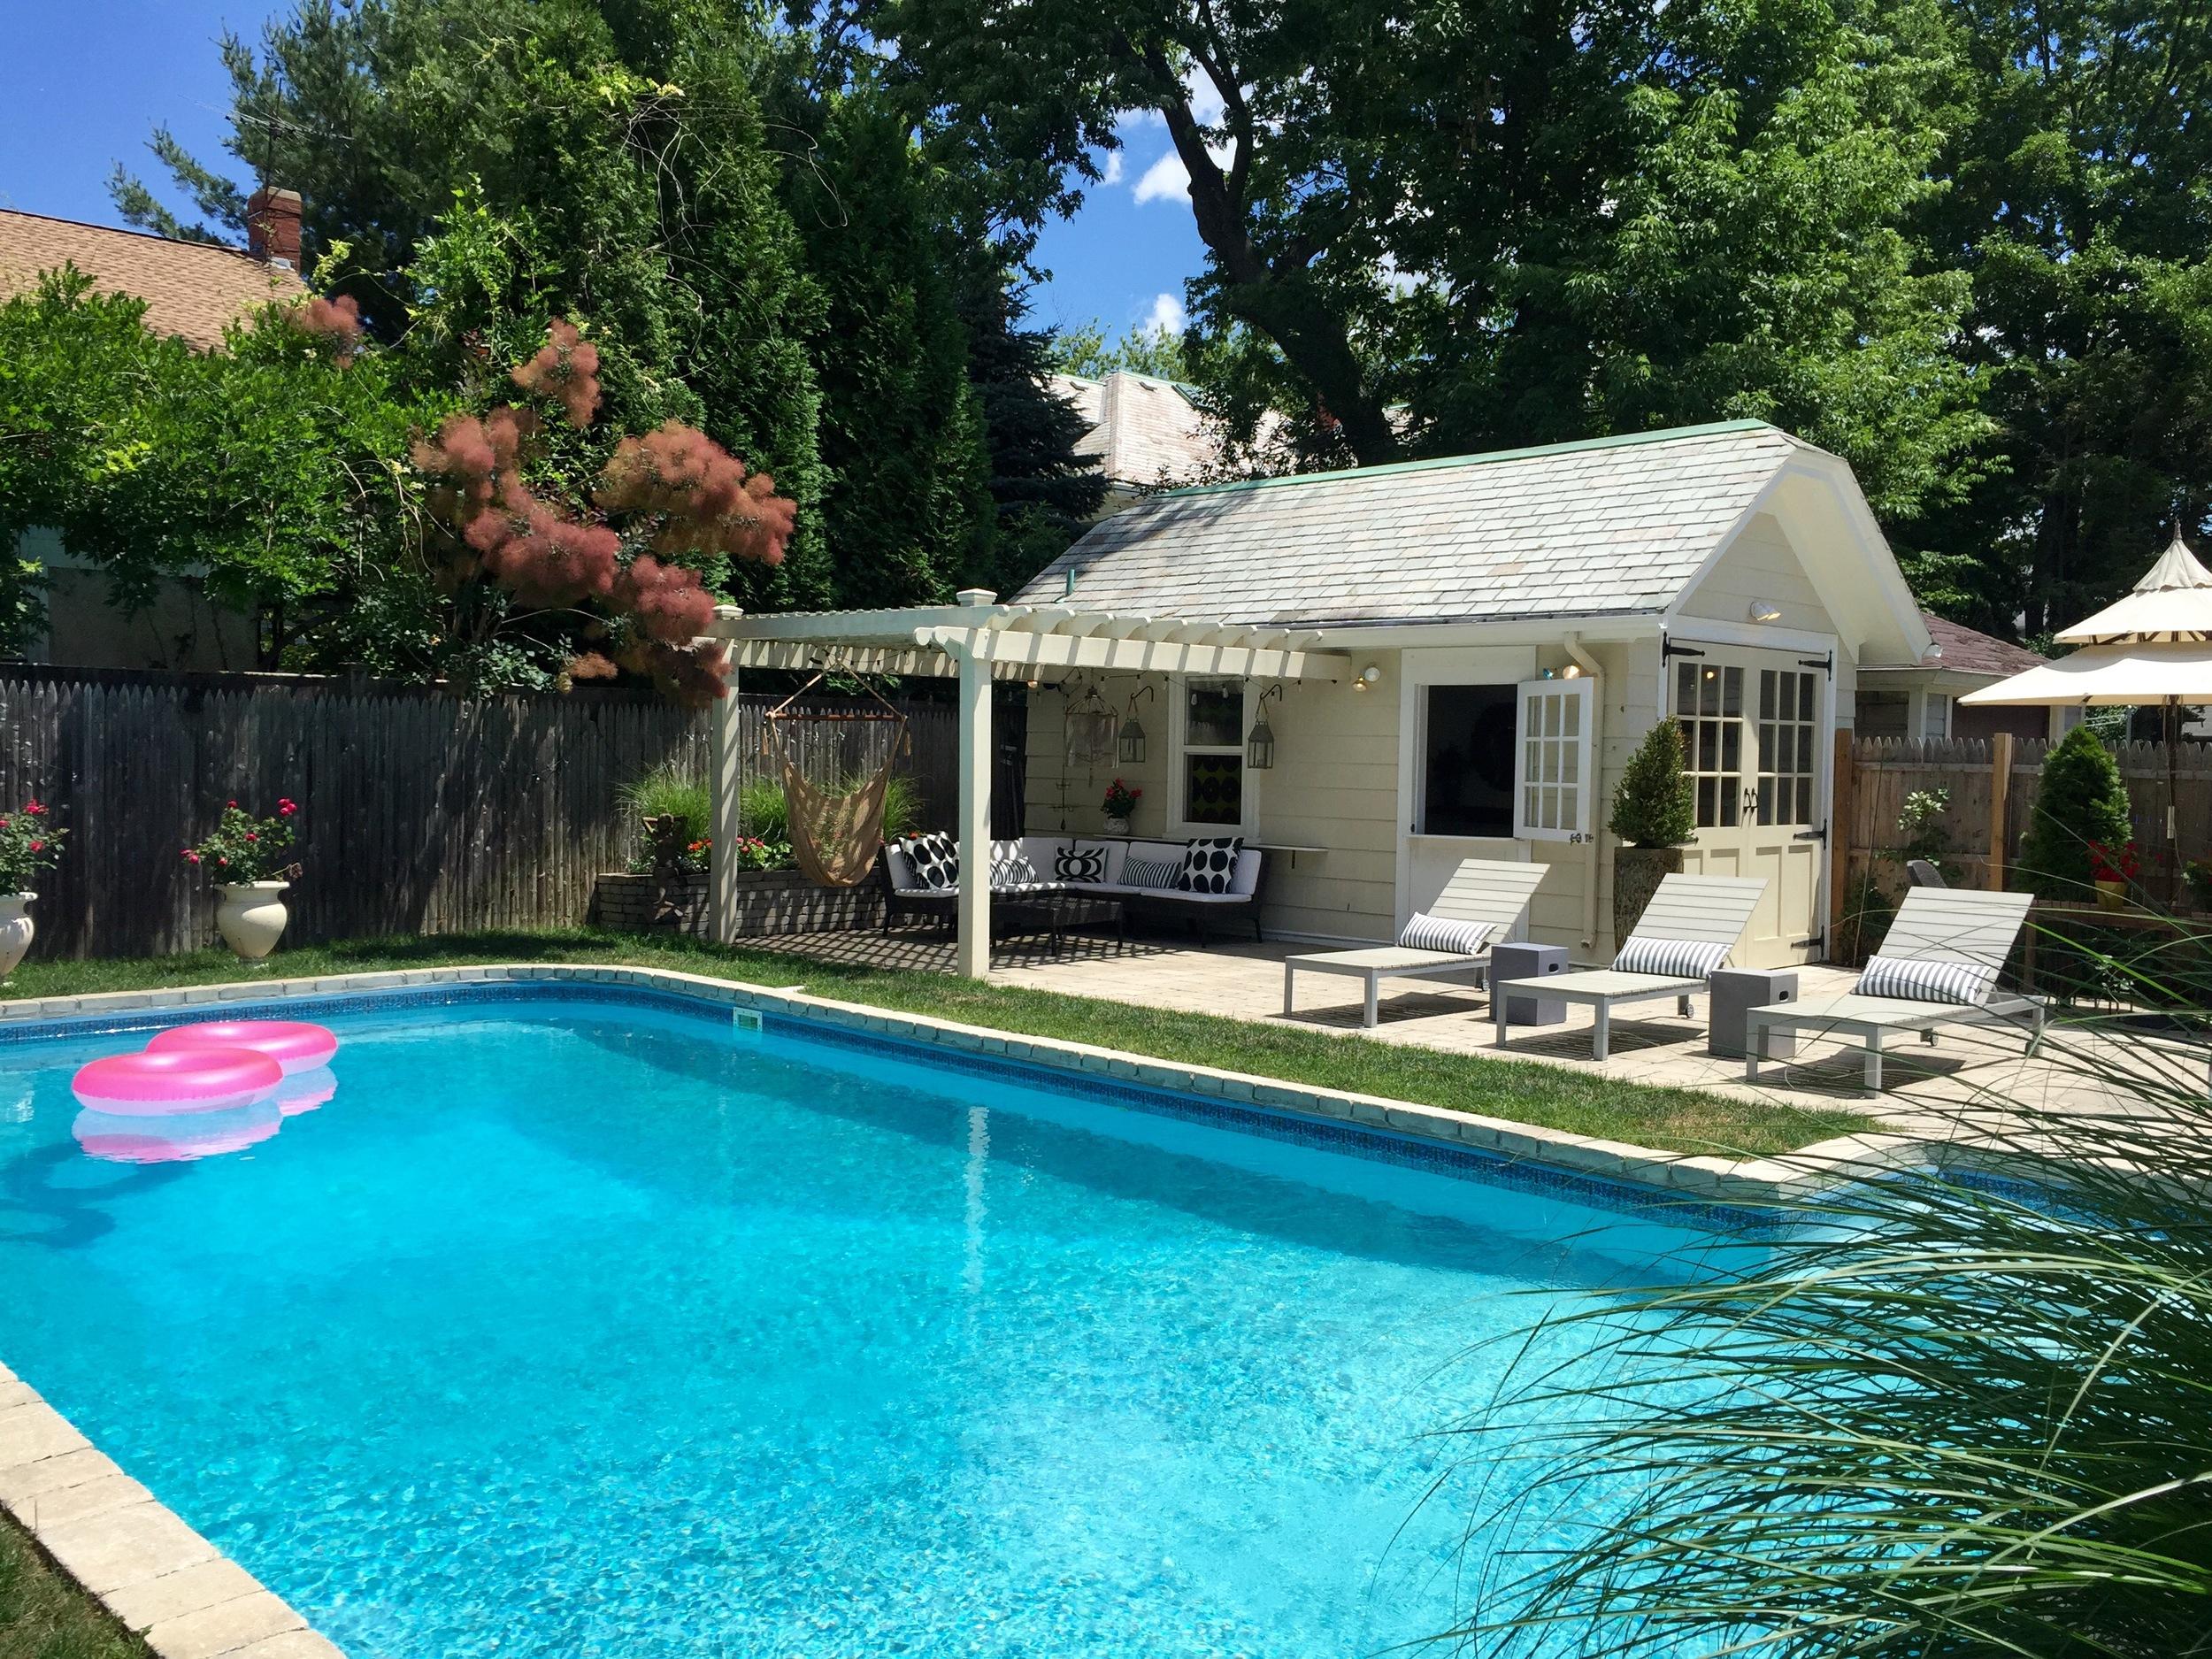 Pawtucket Pool Garden